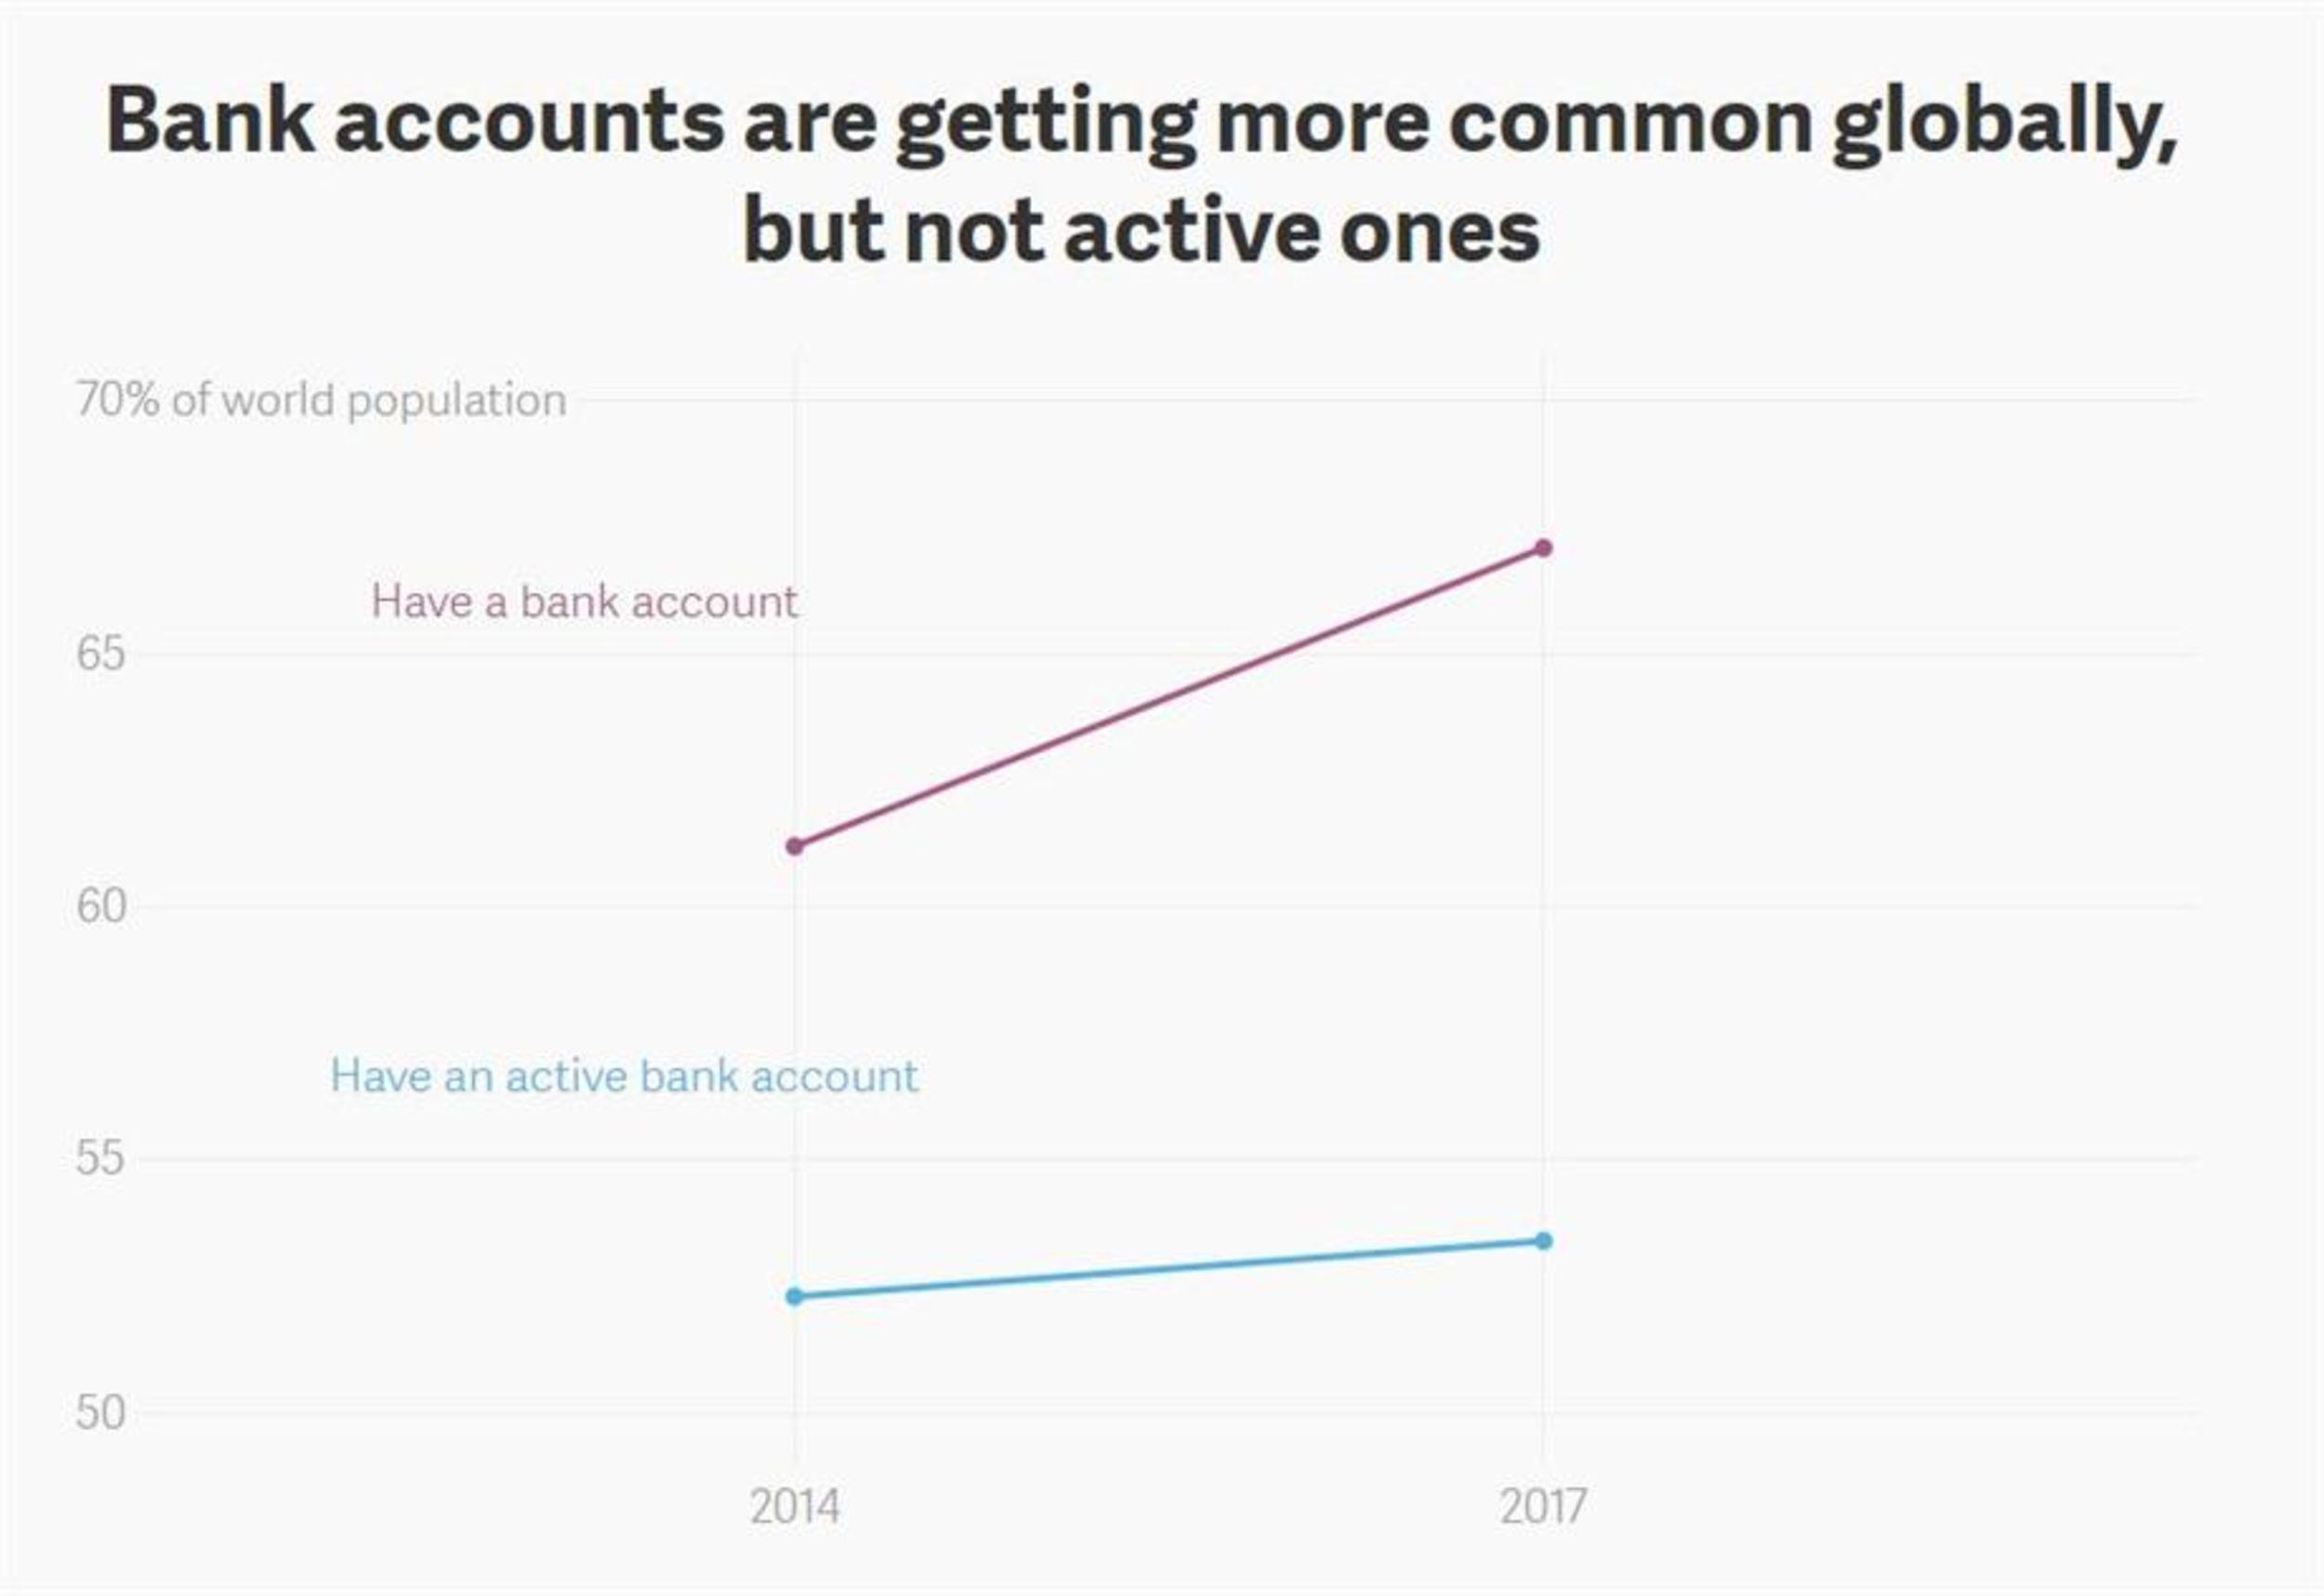 Active bank accounts, open bank accounts